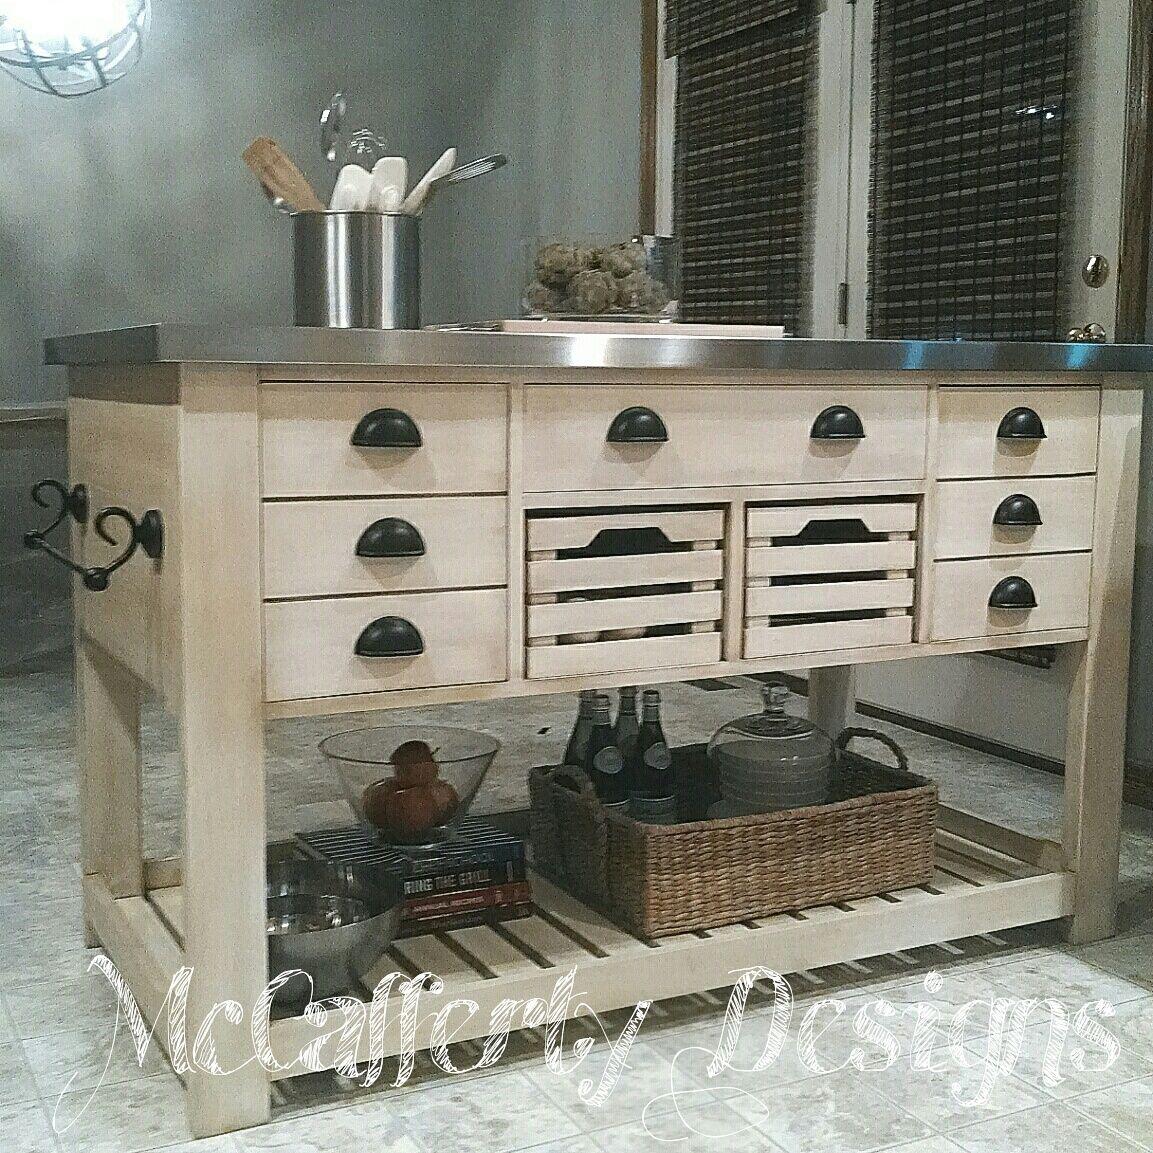 Kitchen Island Diy Projects: KitStainless Kitchen Island, Custom Built